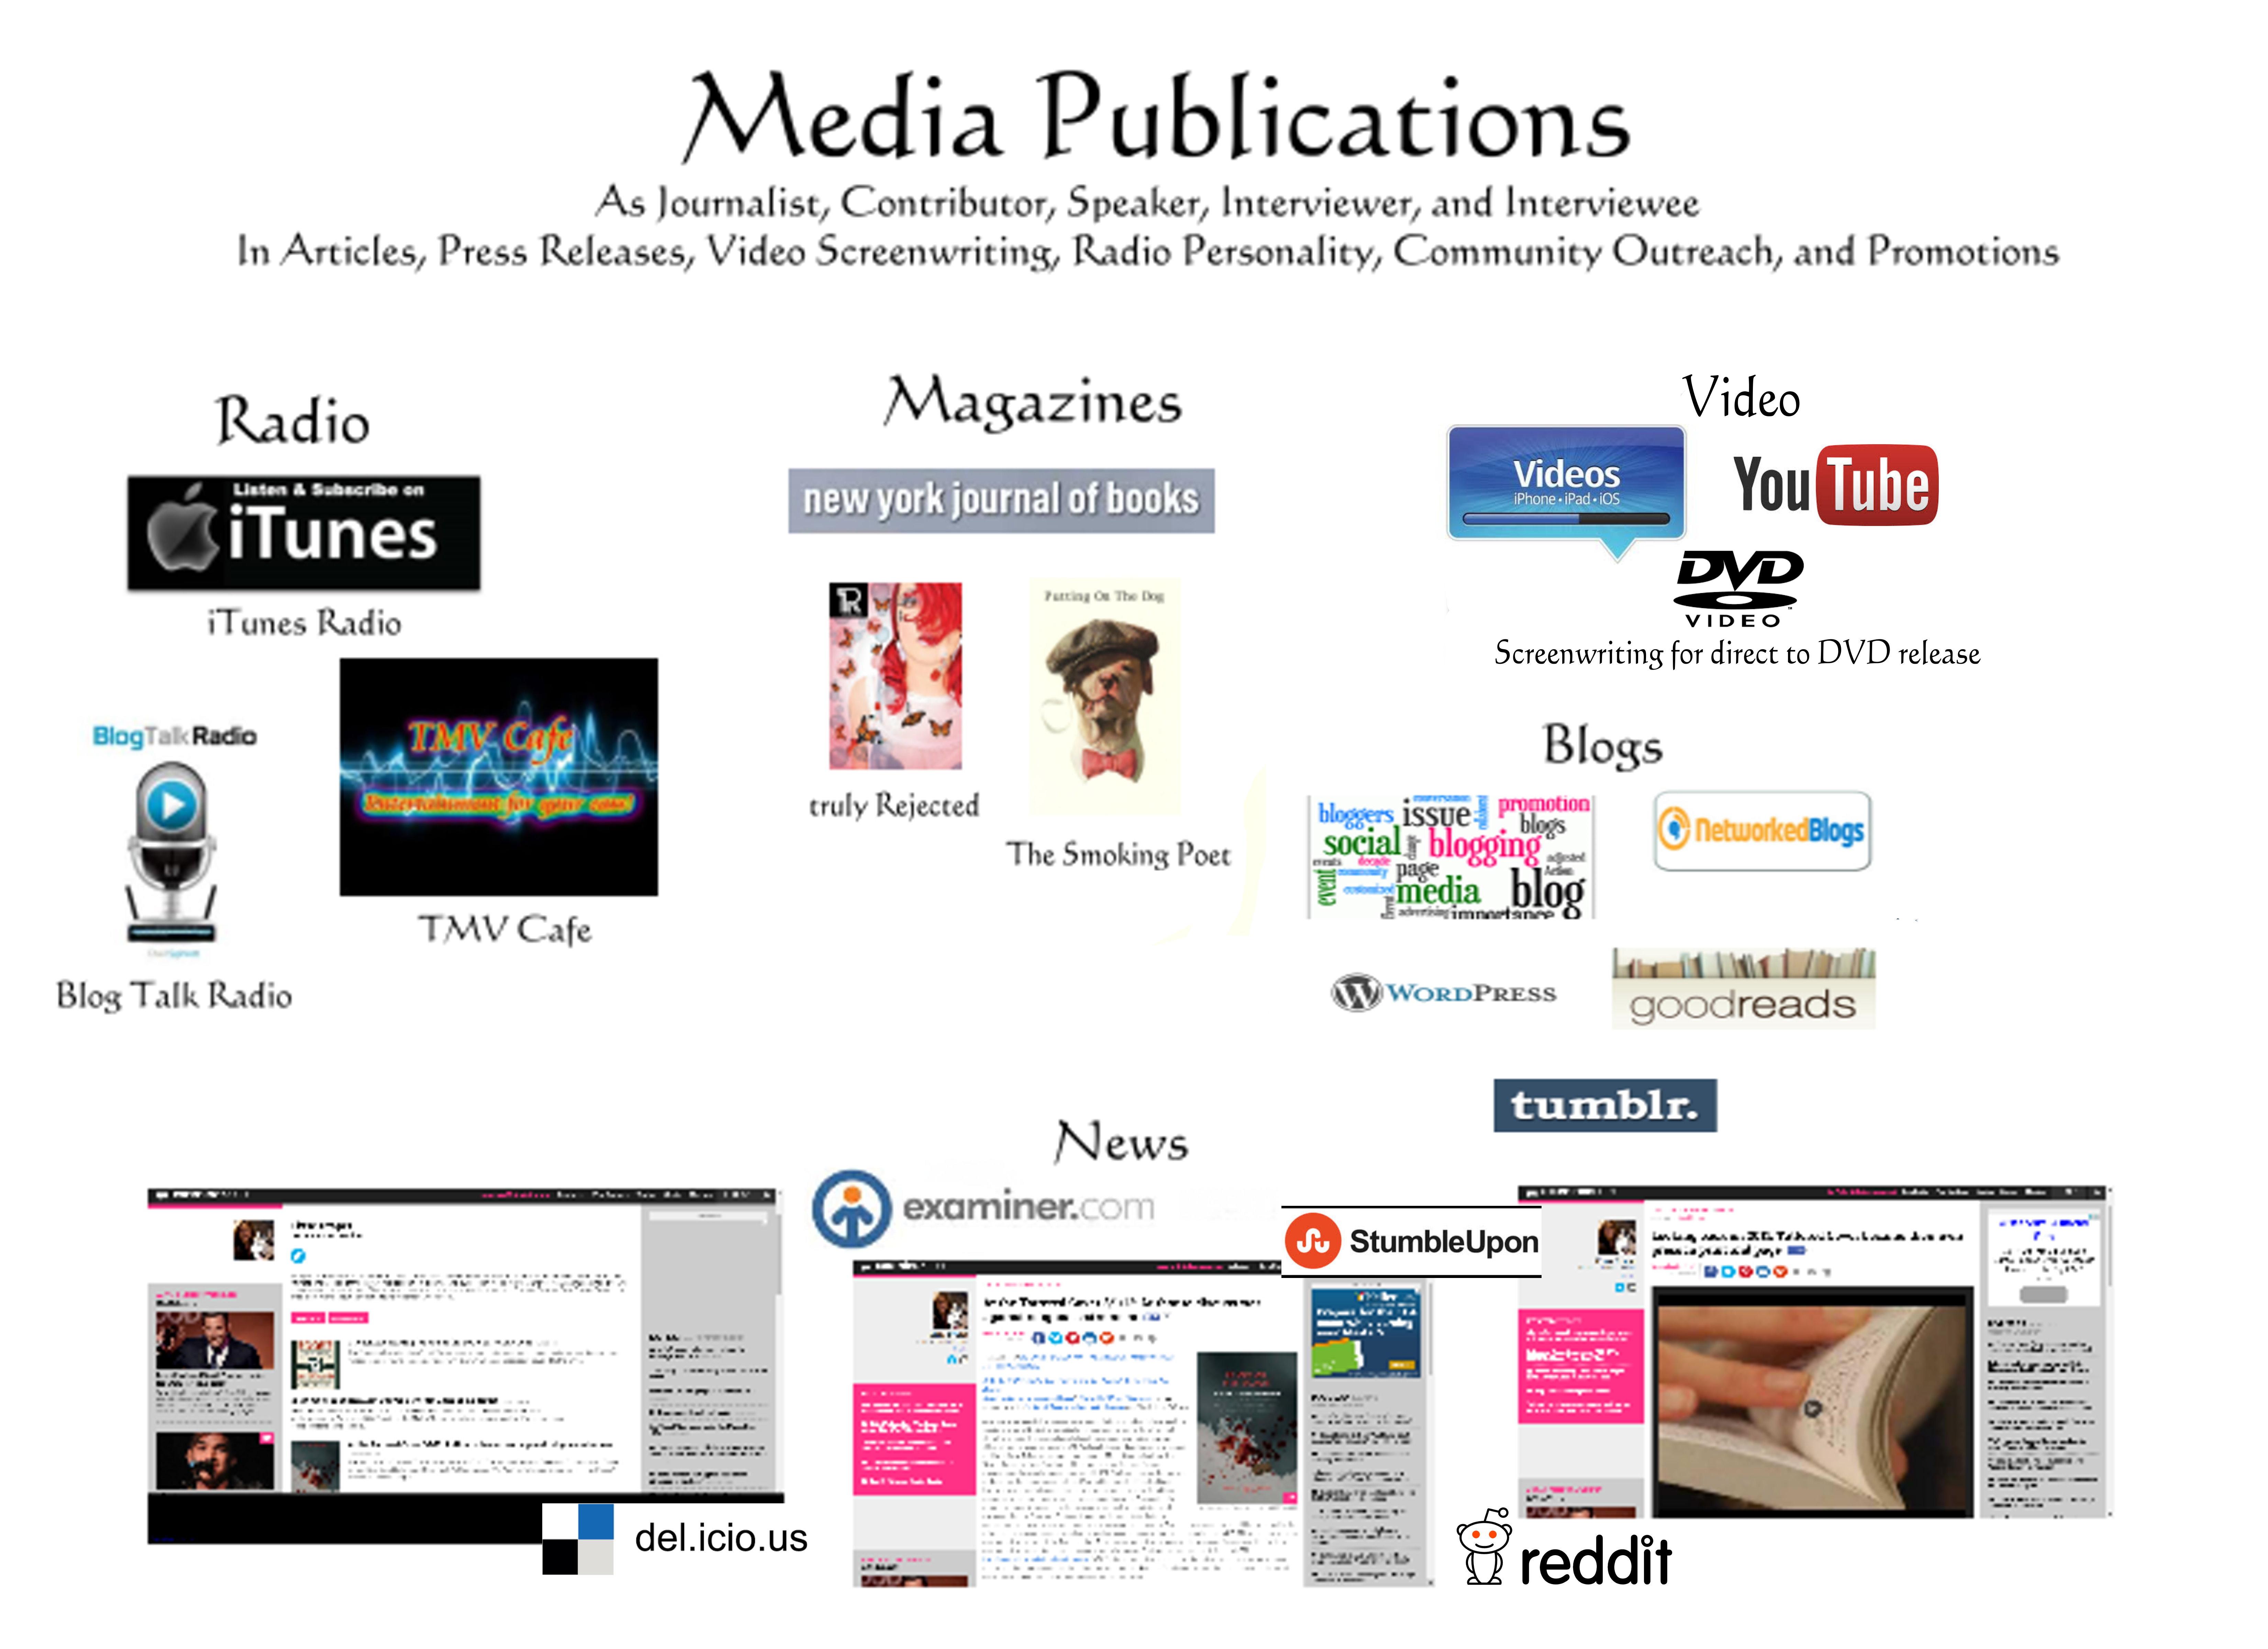 Media Pub portfolio